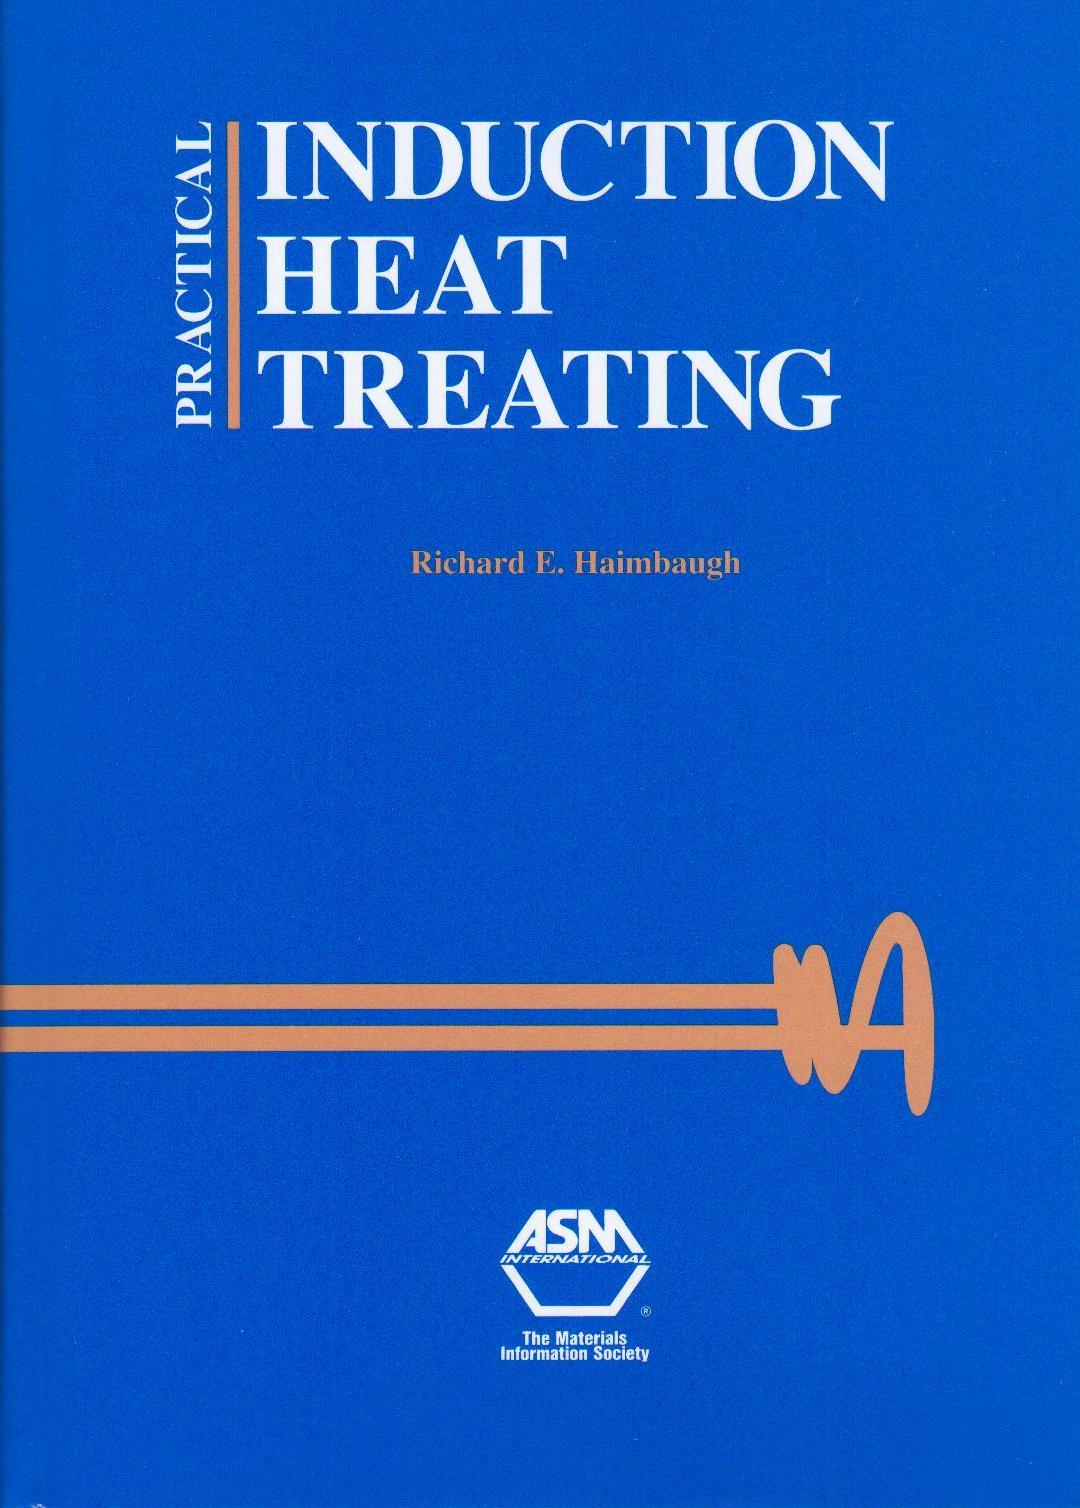 Practical Induction Heat Treating, R.E. Haimbaugh, 0871707438, 9780871707437